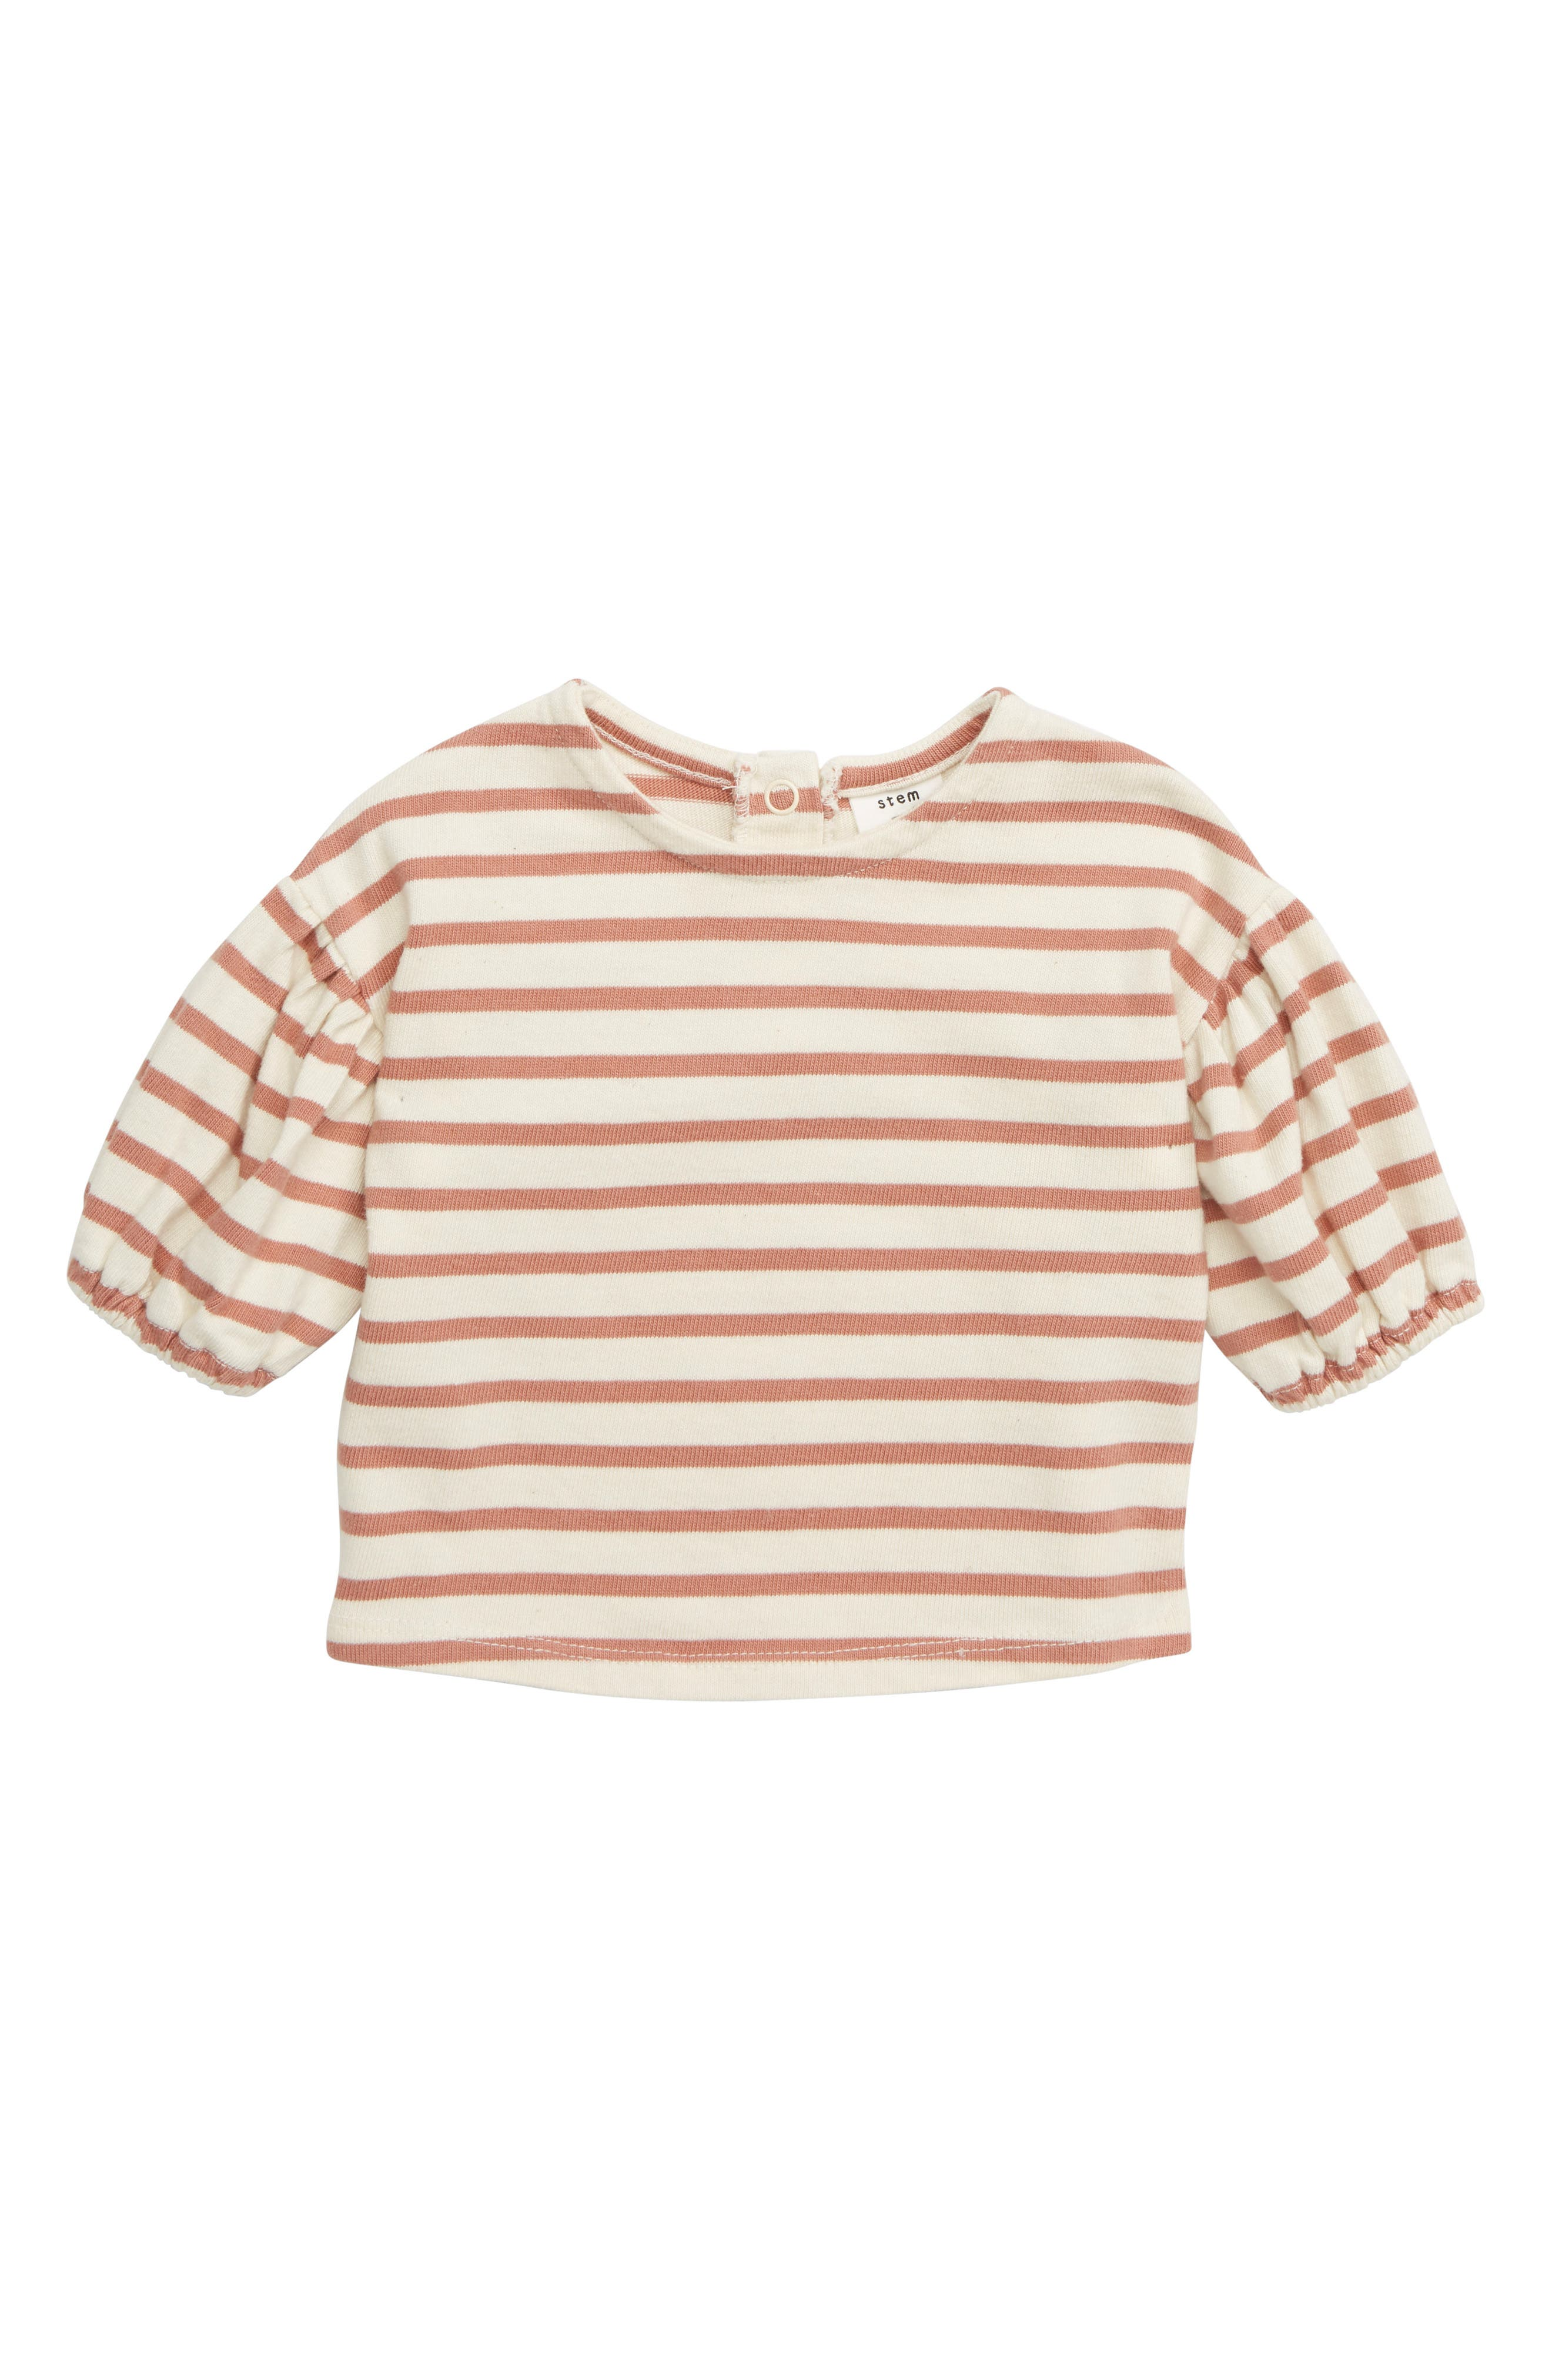 new Bundle Of 3 Baby Girl 3-6 Mths 1 X Orange Dress 2 X Cream Tops Baby